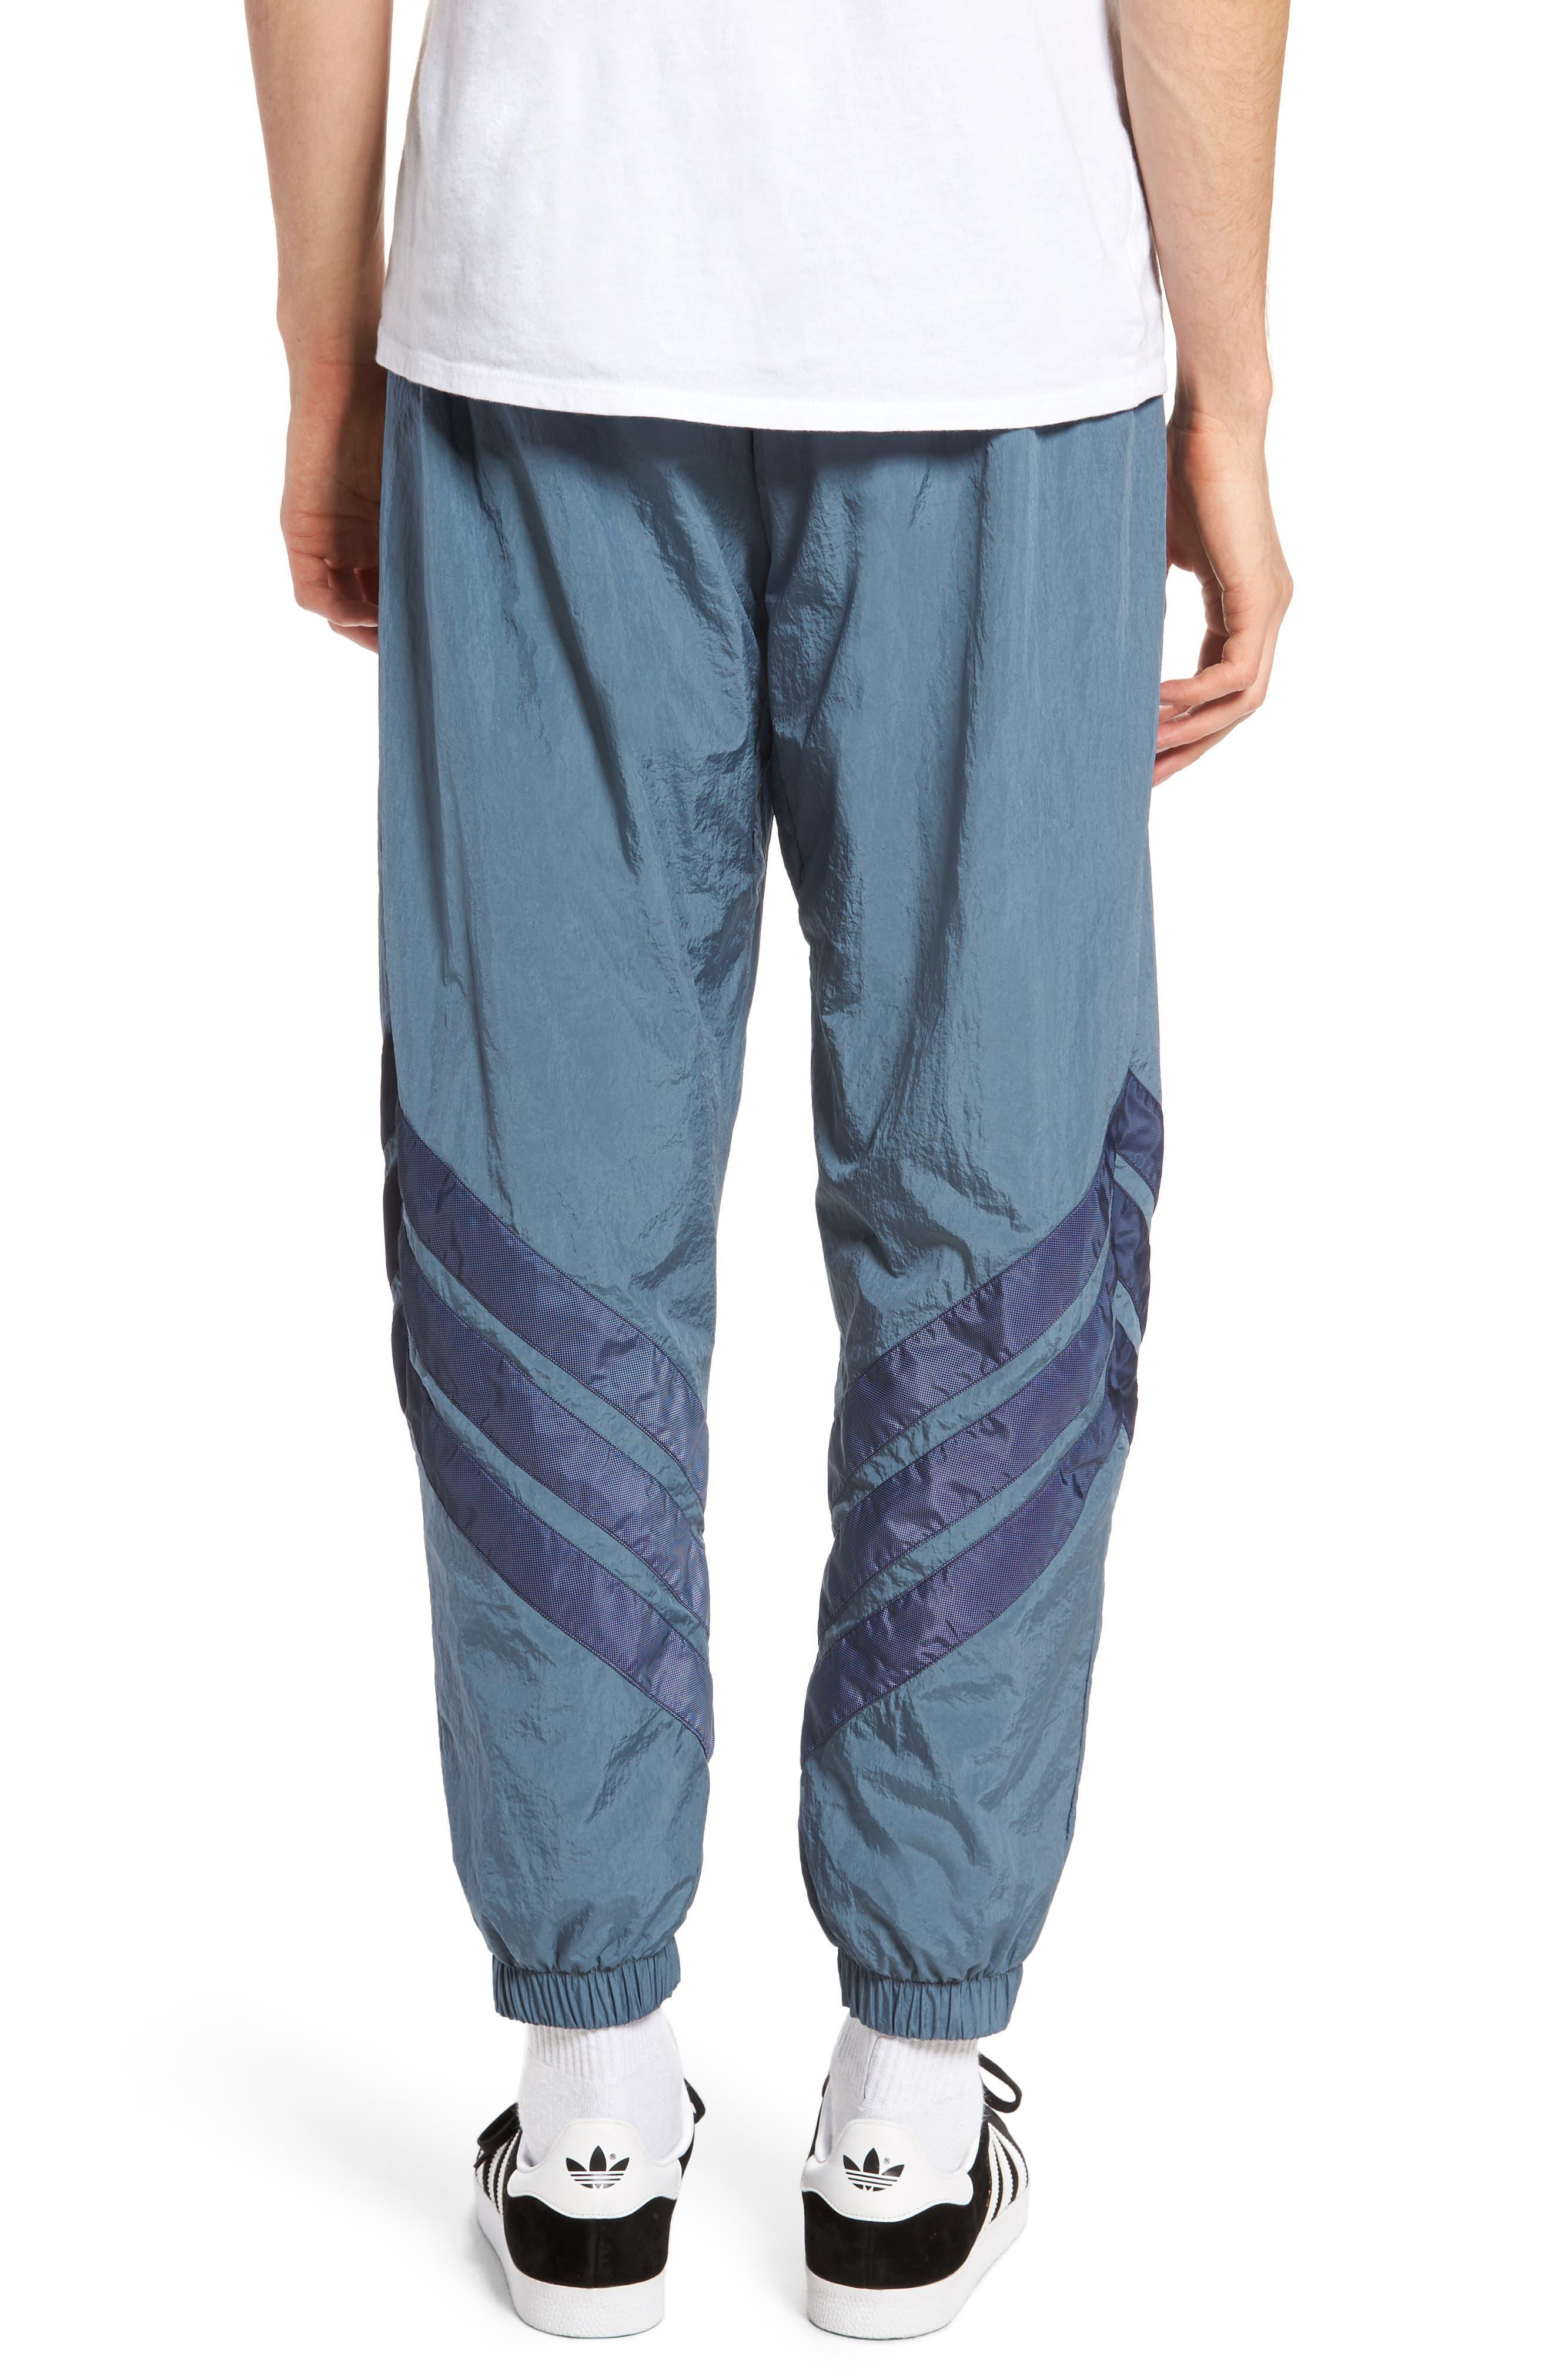 Originals V-Stripe Windpants,                             Alternate thumbnail 2, color,                             Raw Steel/ White